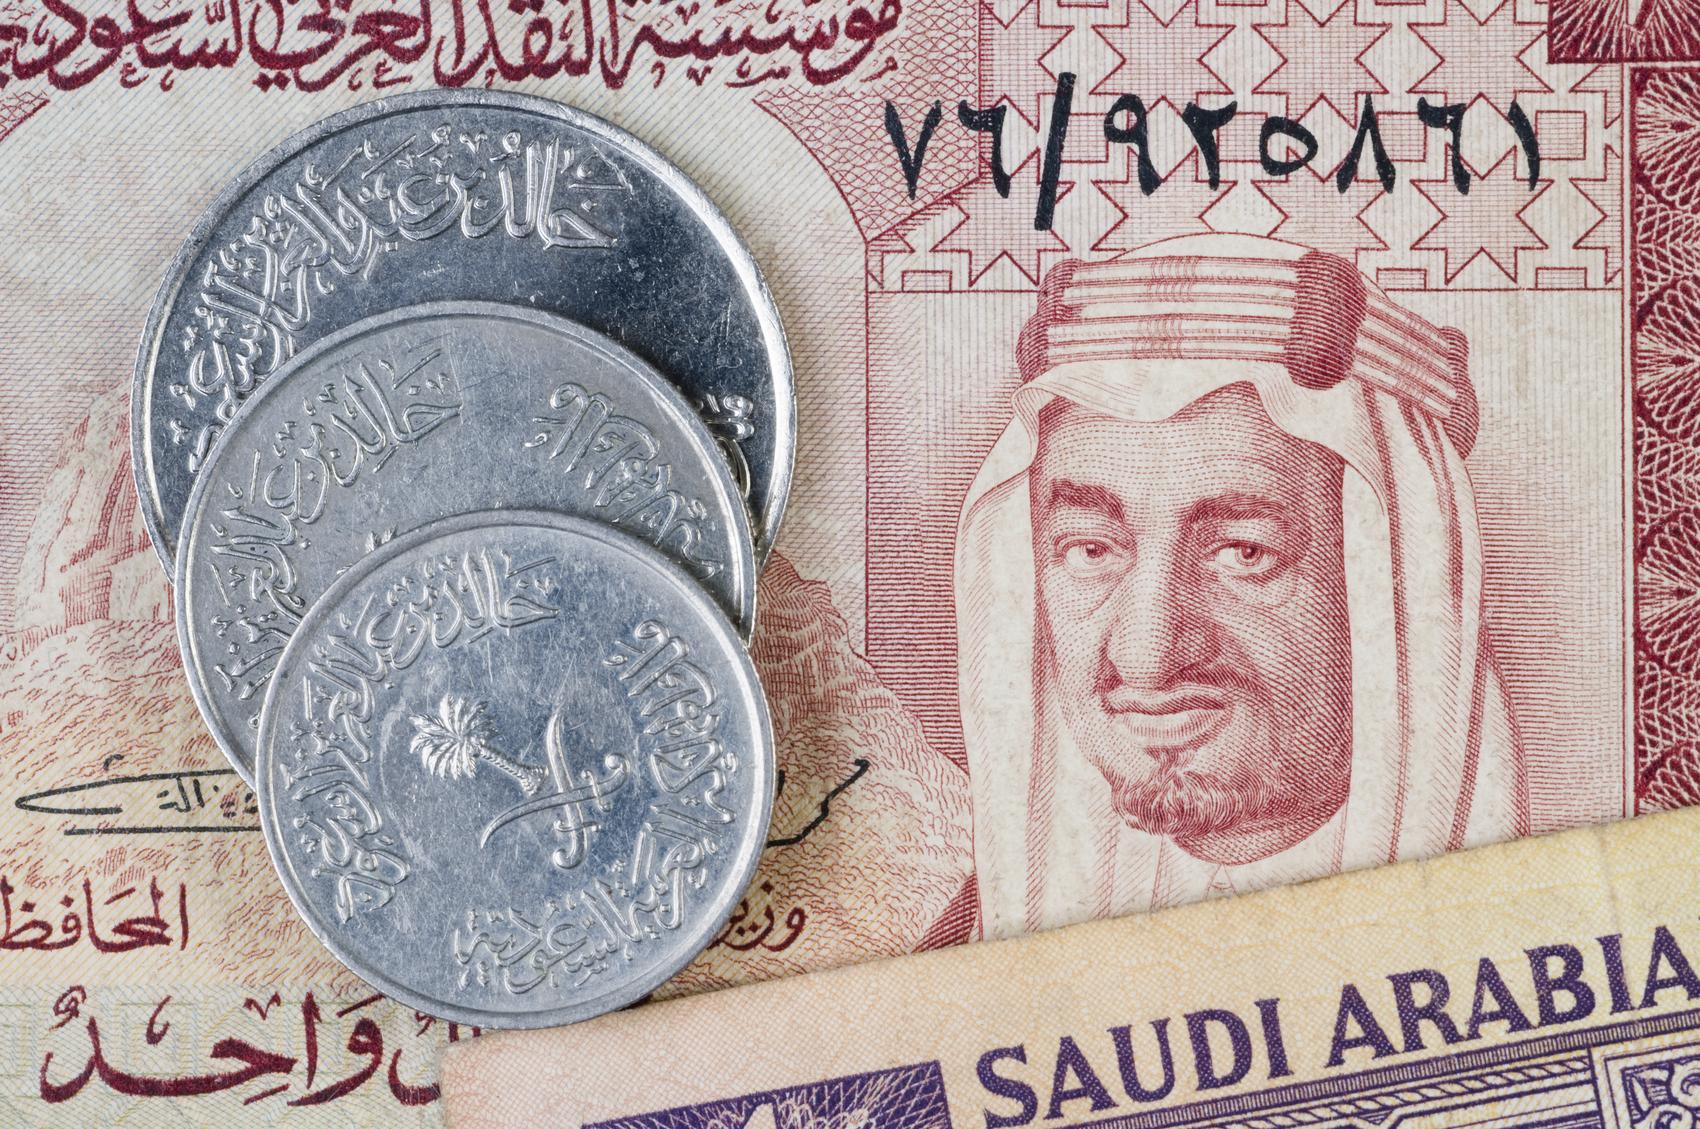 Saudi Arabian banknotes & coins